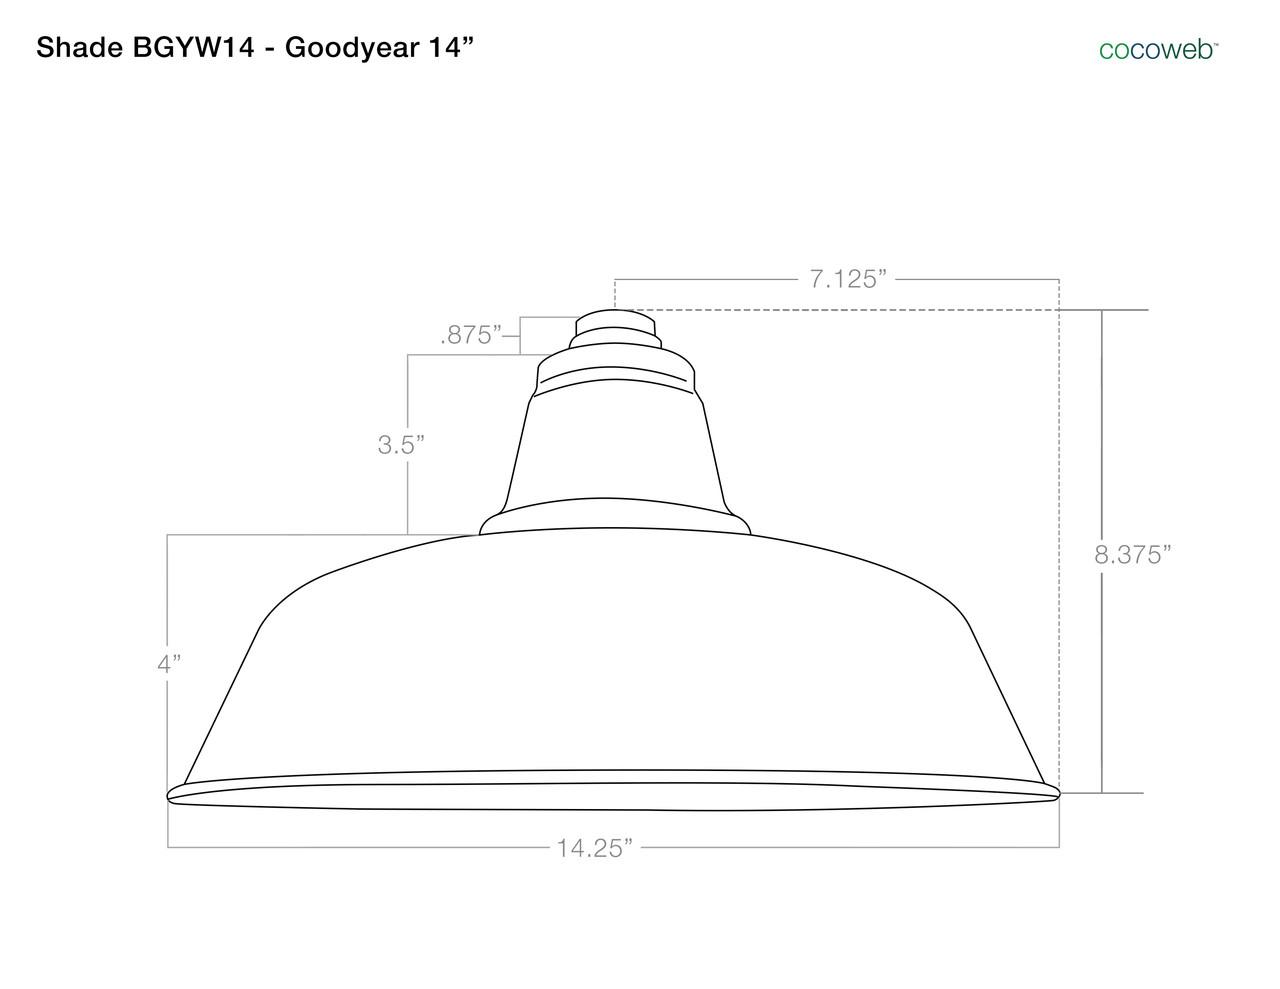 industrial galvanized silver 14 goodyear led indoor outdoor barn lights  [ 1280 x 989 Pixel ]